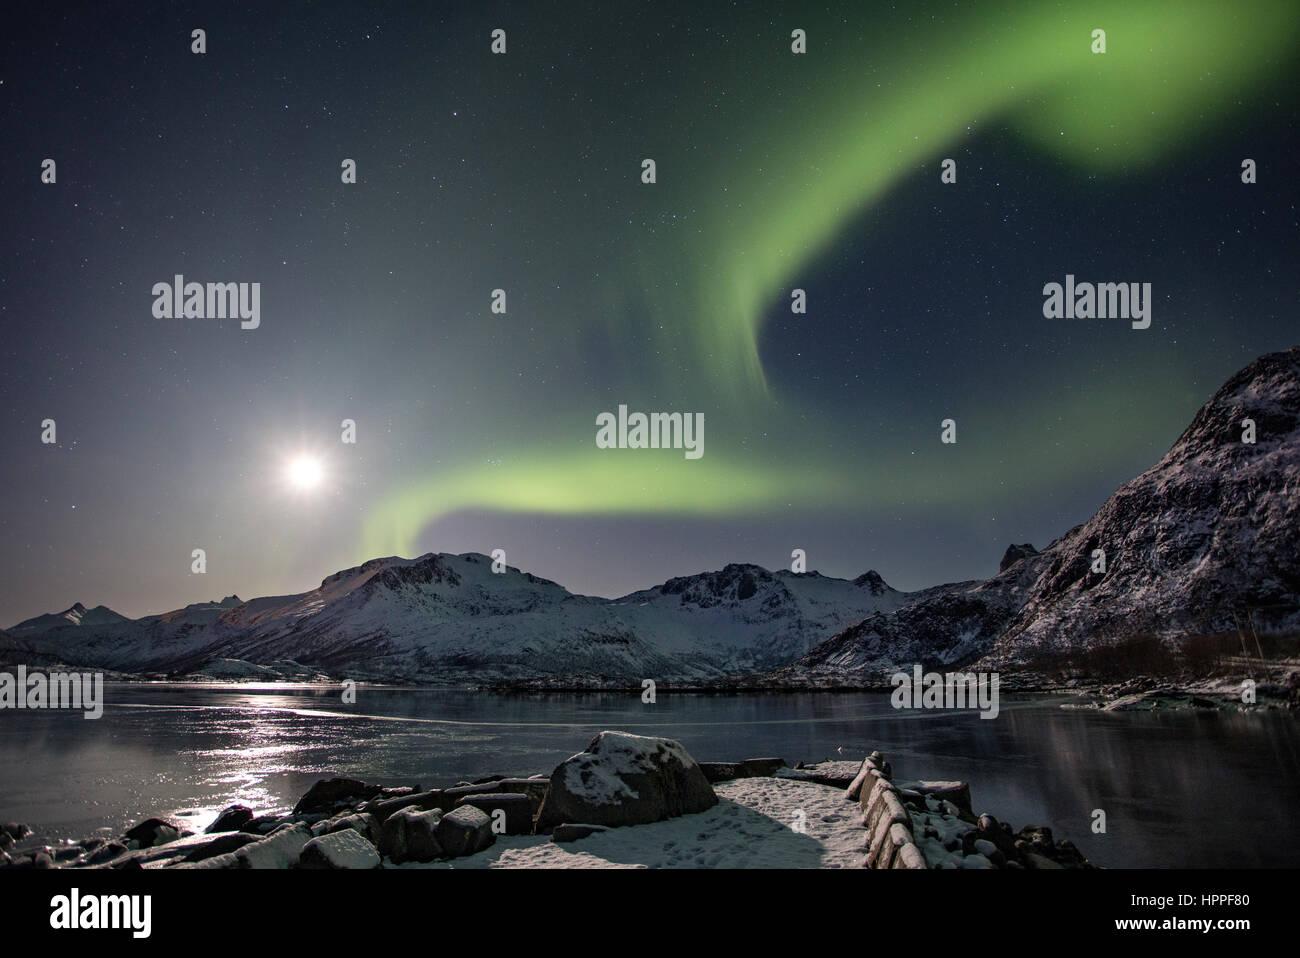 aurora borealis over Lofoten Islands, Norway, Europe - Stock Image